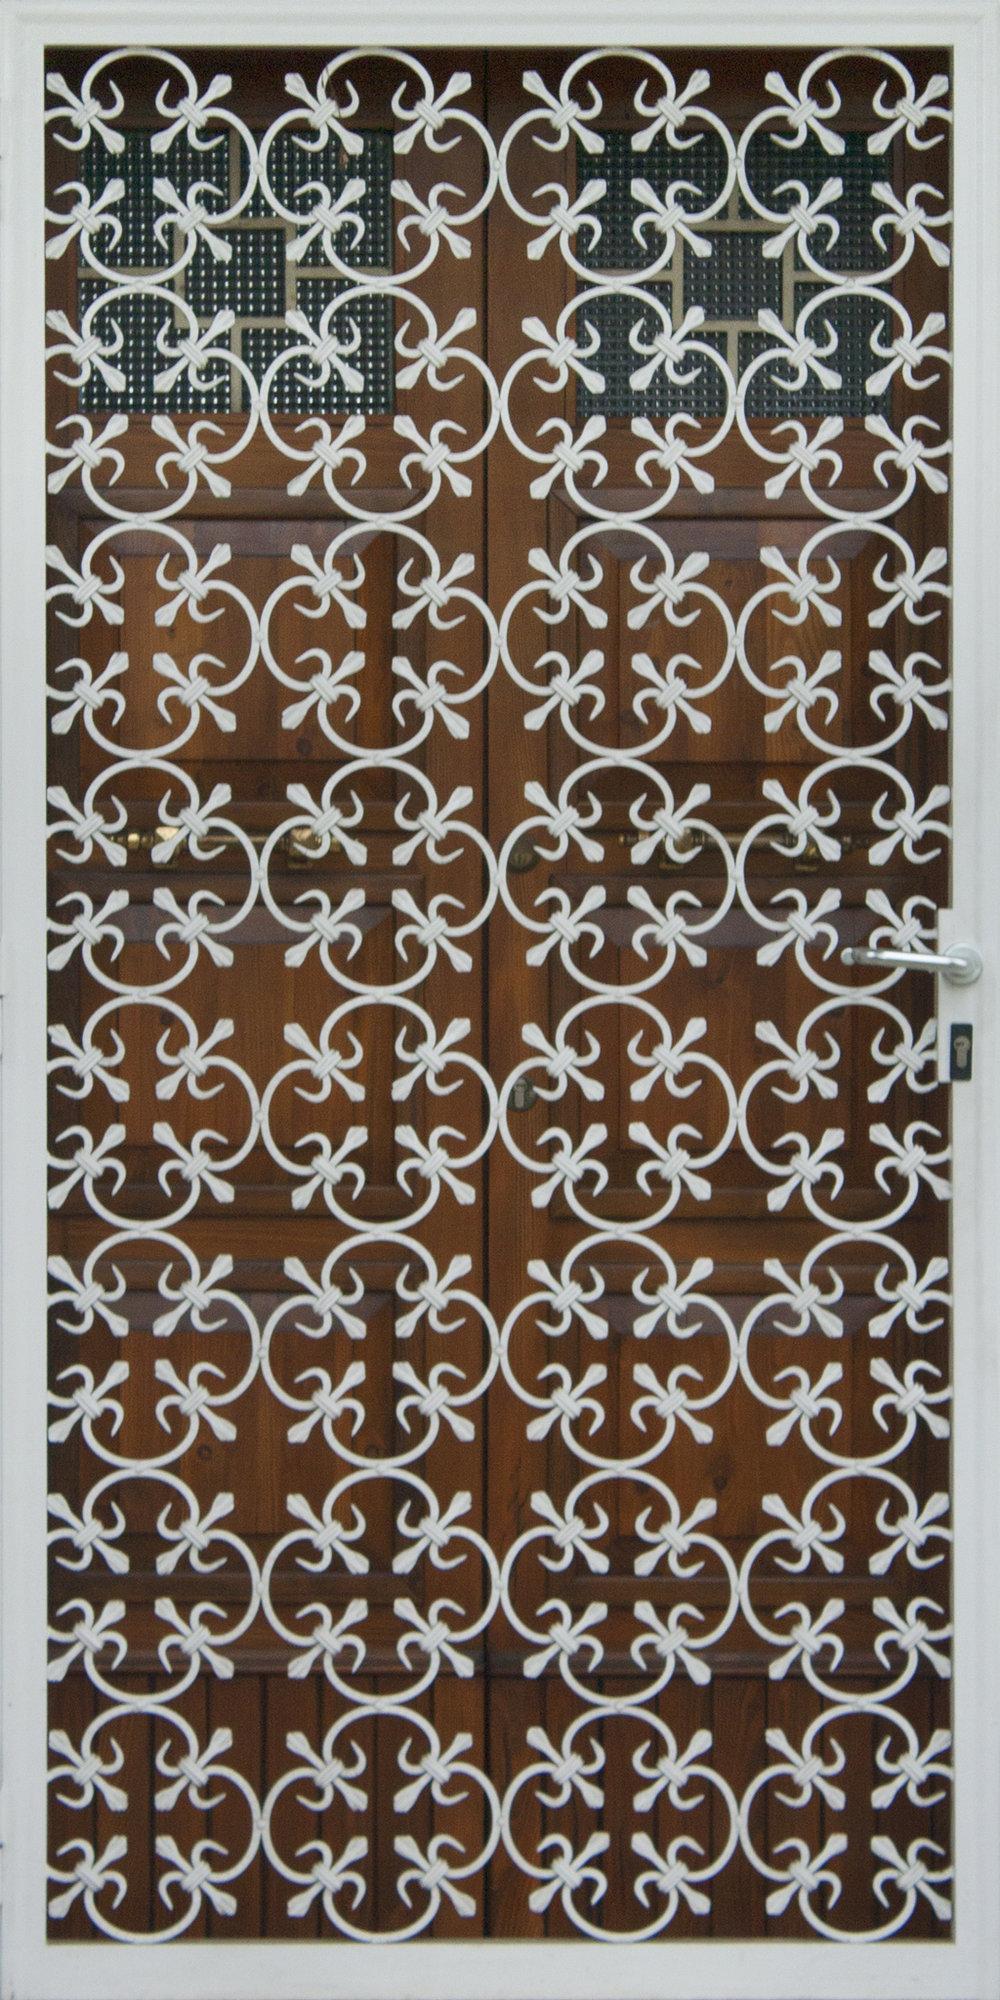 Modern Ornate Door.jpg